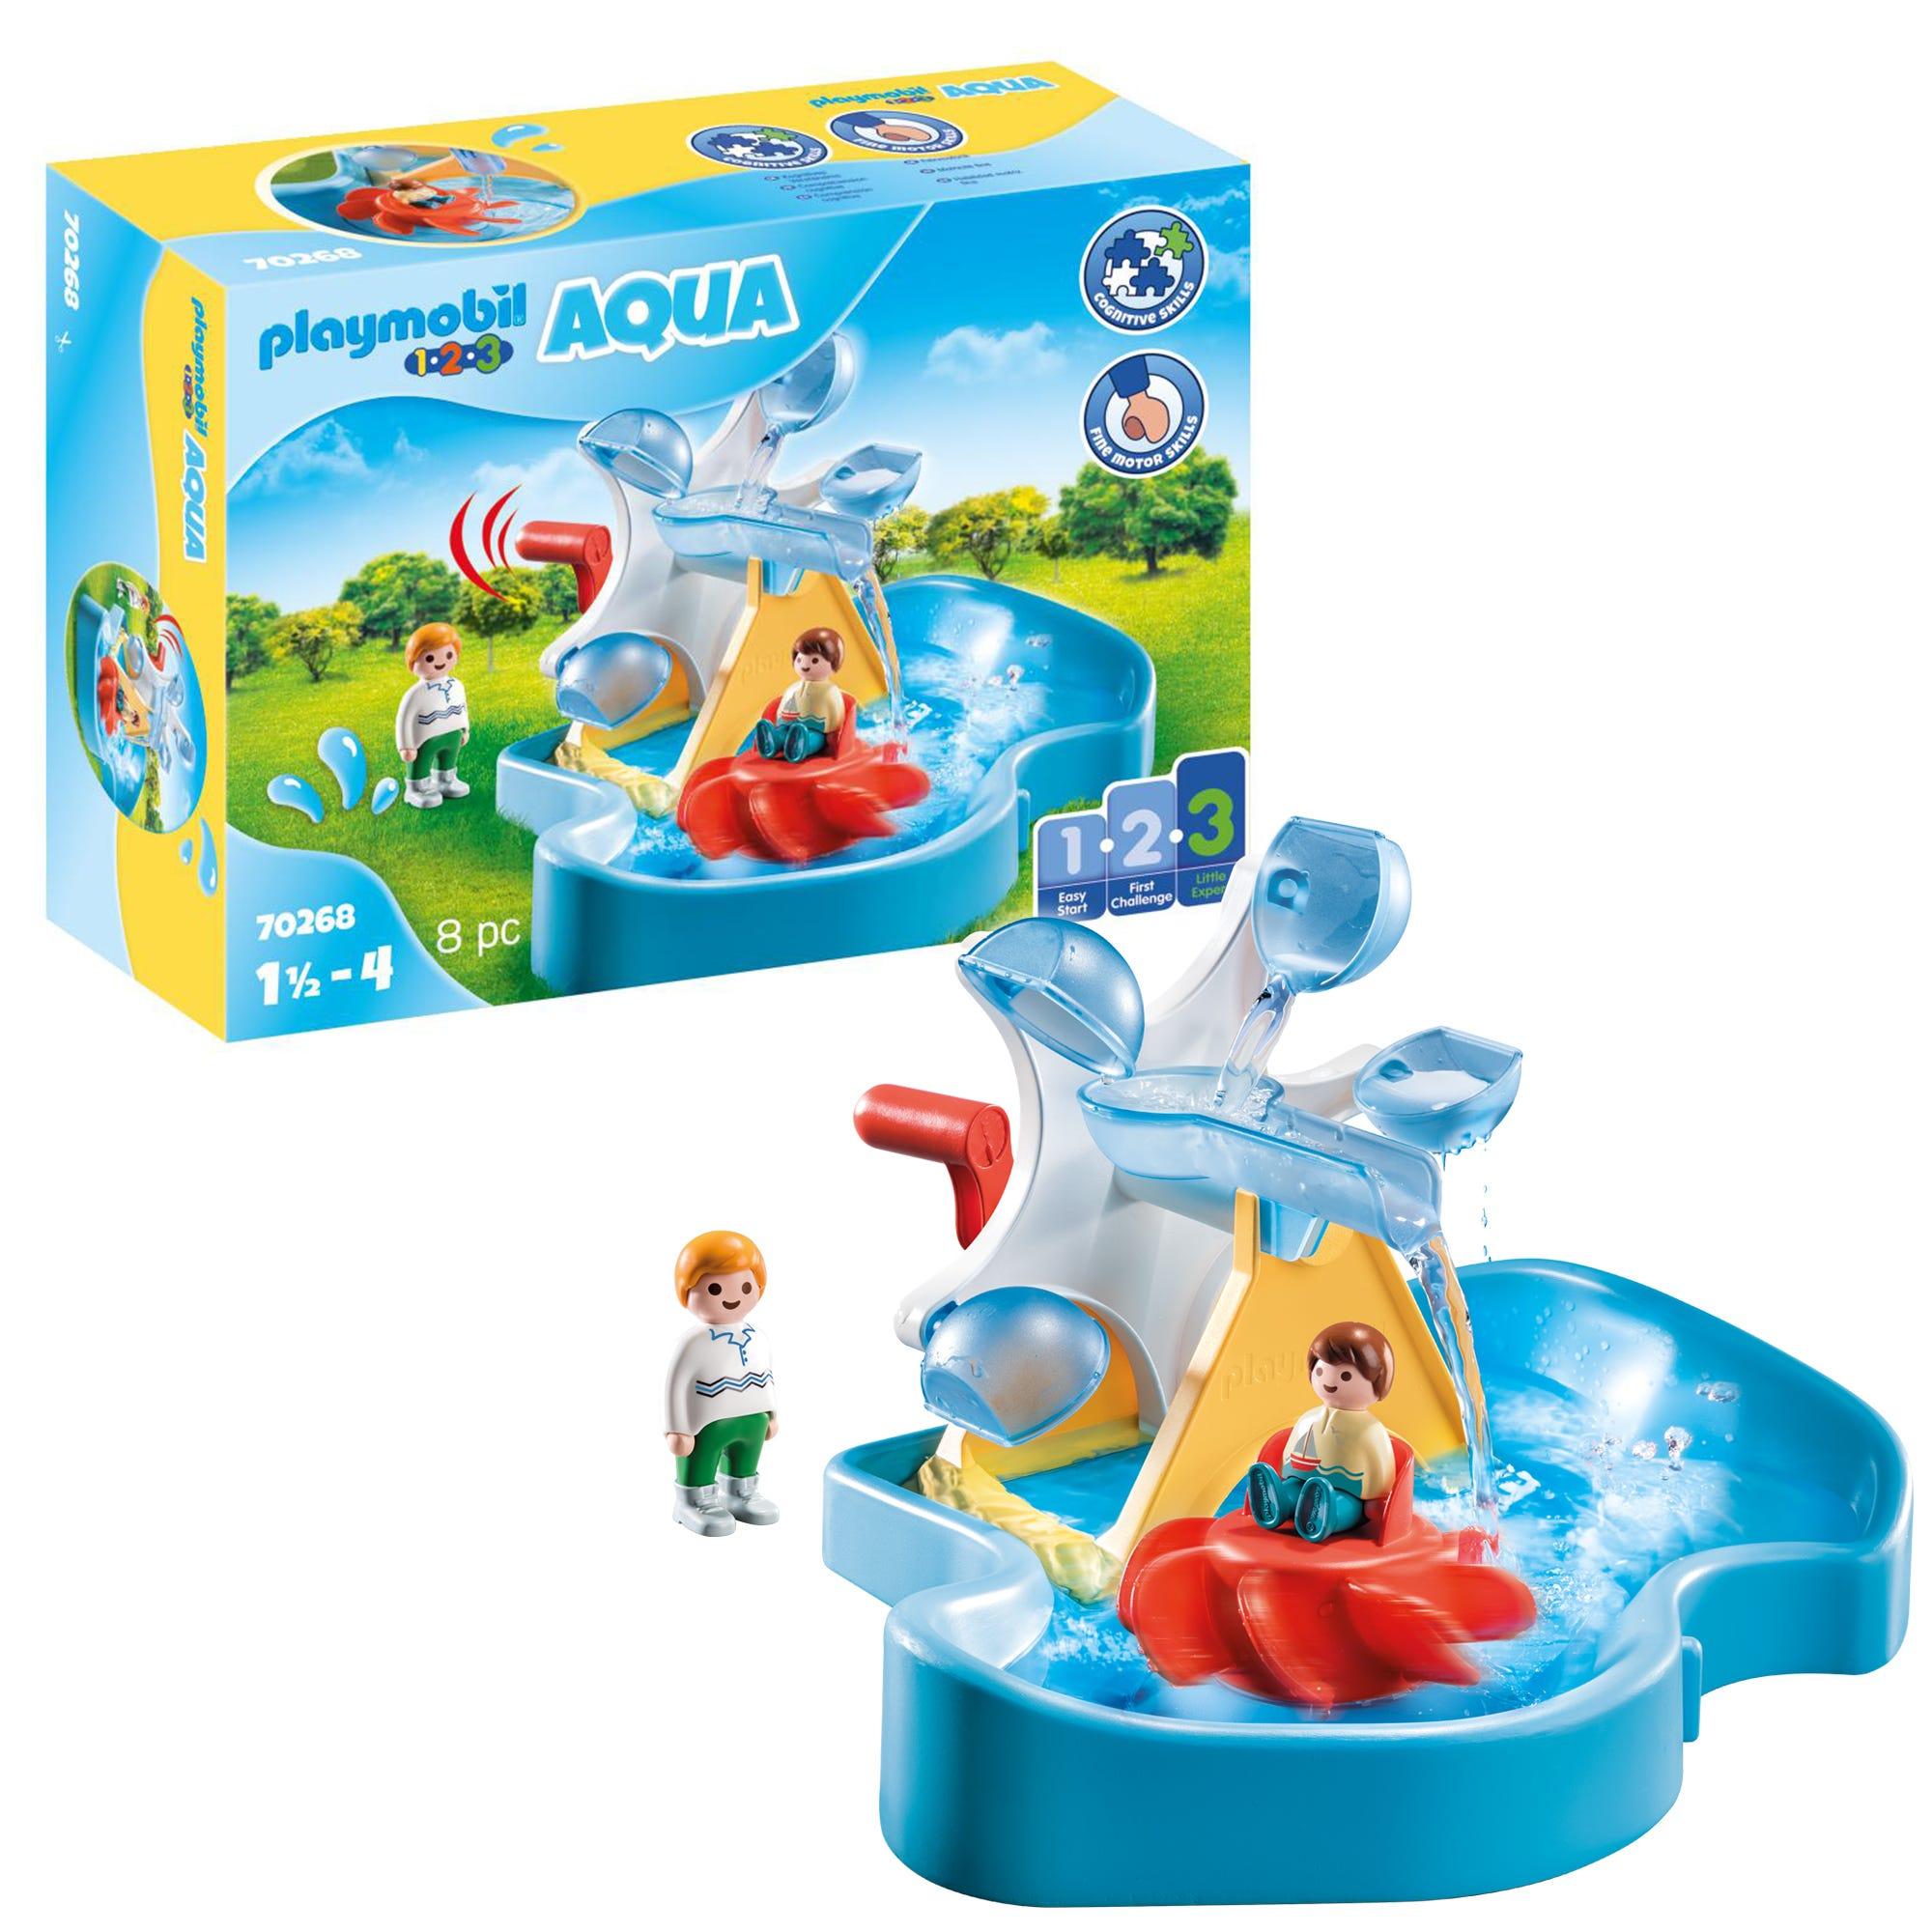 Playmobil 1.2.3 70268 AQUA Water Wheel Carousel For 18+ Months